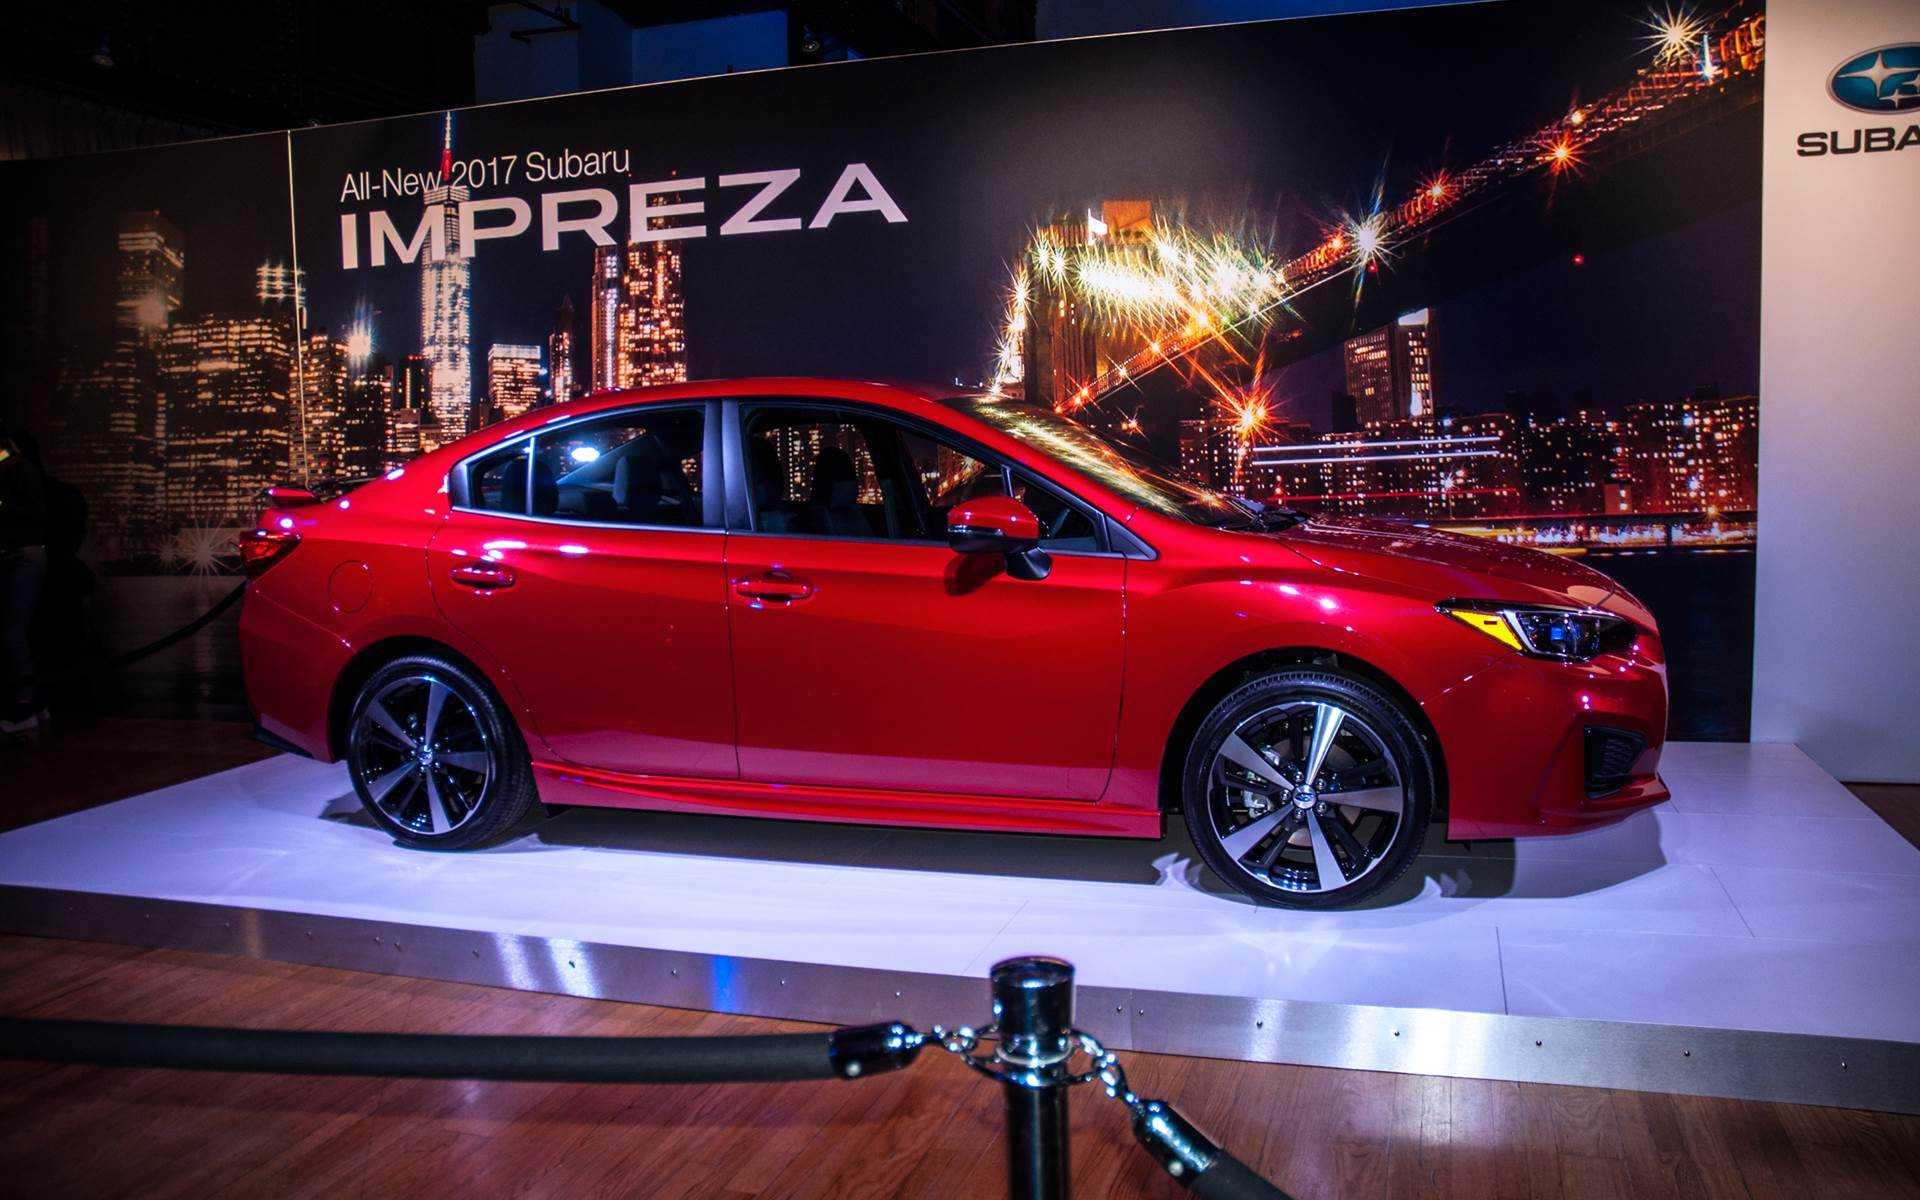 2017 Subaru Impreza Updated Platform, Design And Specs